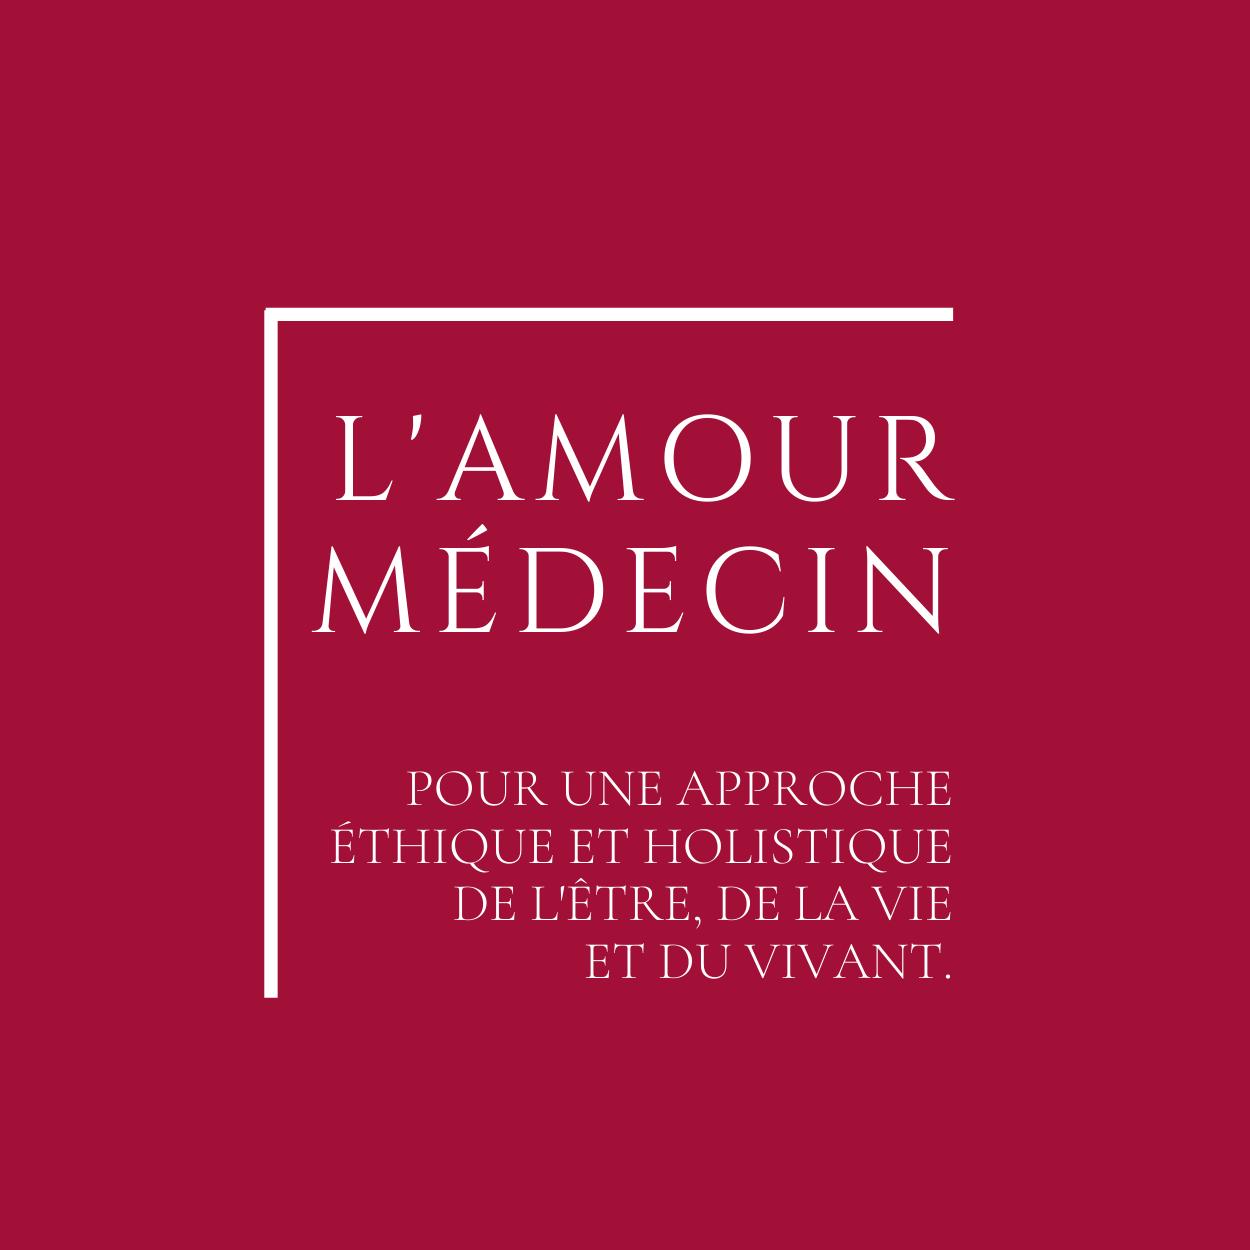 Logo lamourmedecin